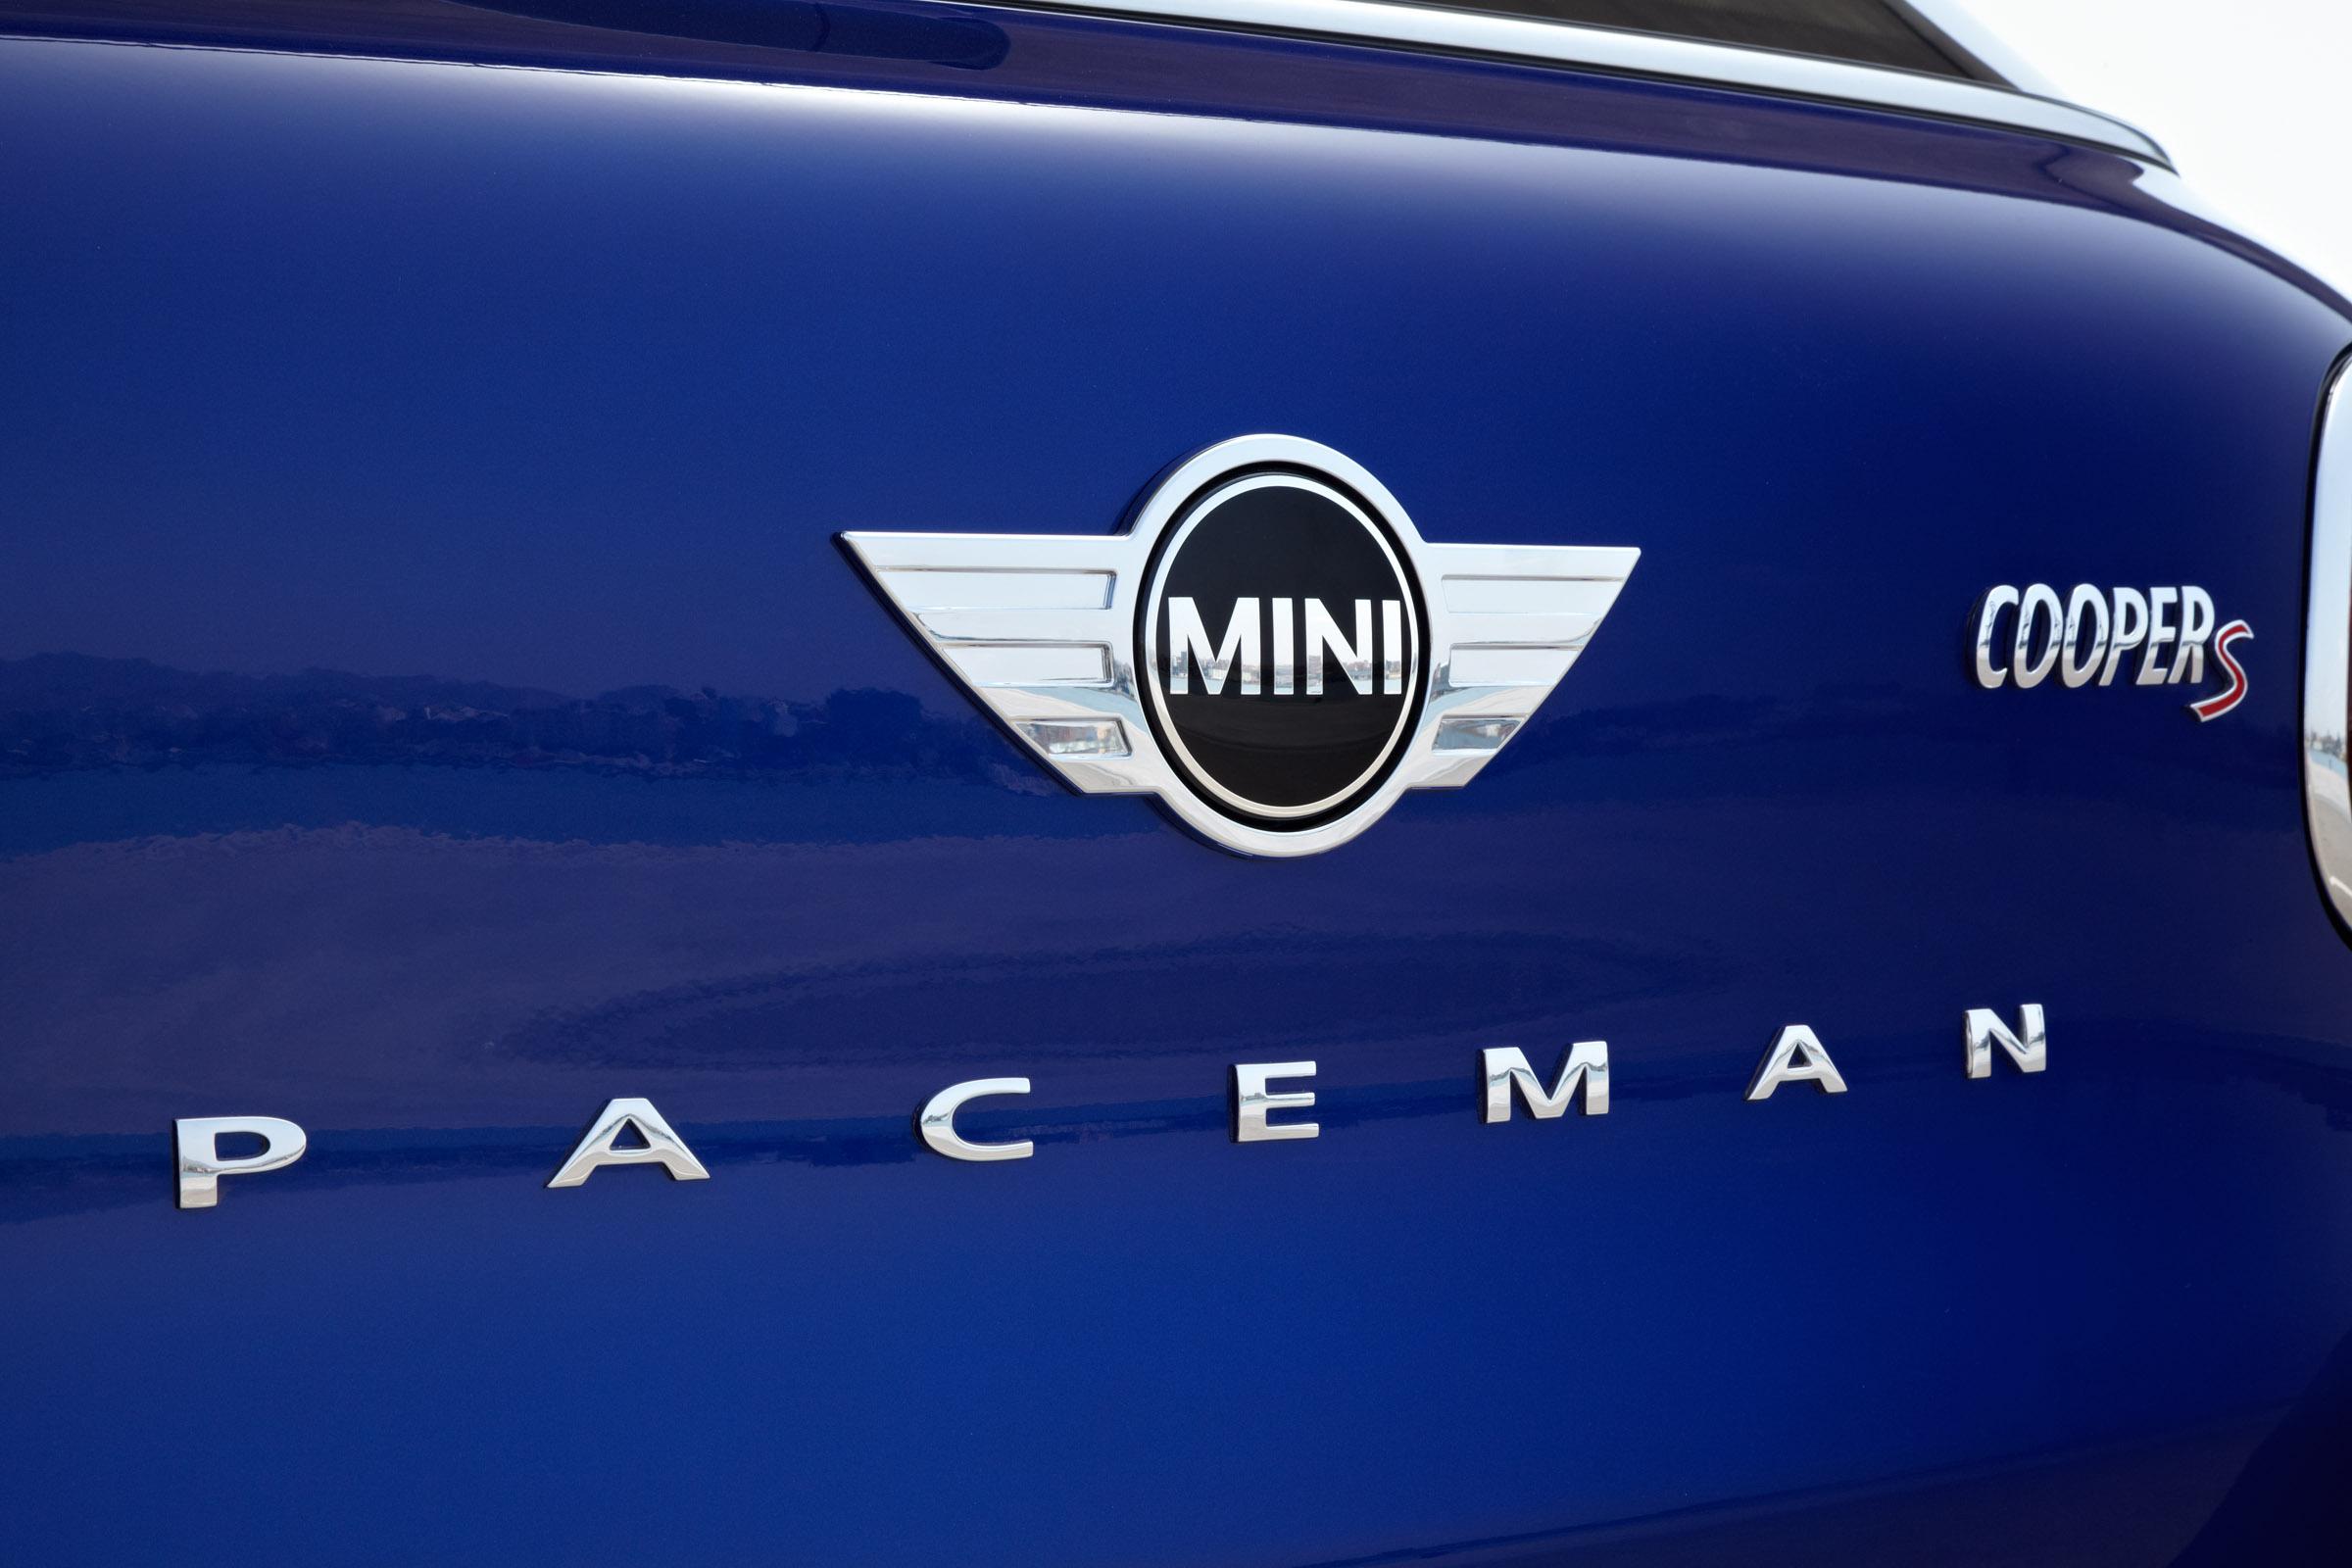 Stylish Car Wallpaper Mini Cooper Logo Mini Car Symbol Meaning And History